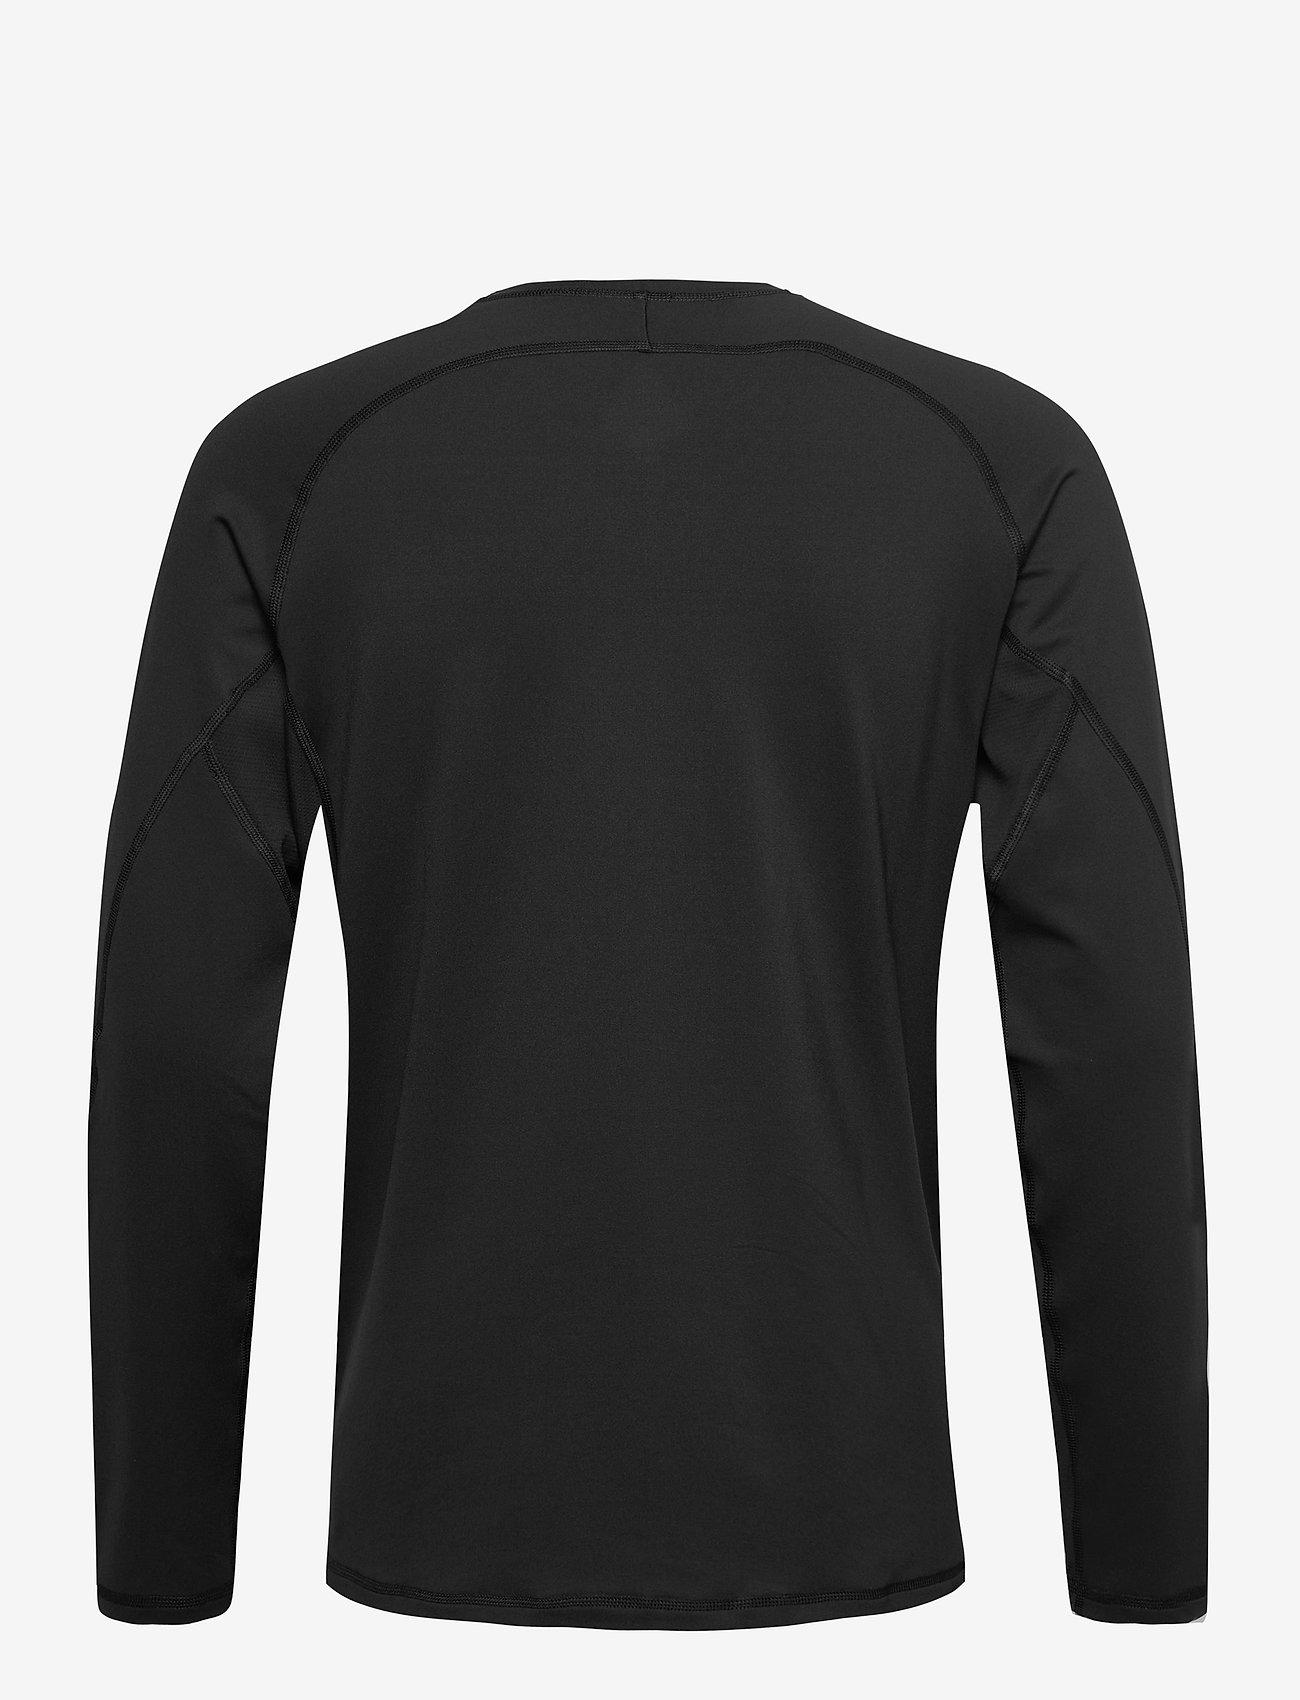 adidas Golf - CLMWRM CREW - bluzki termoaktywne - black - 1